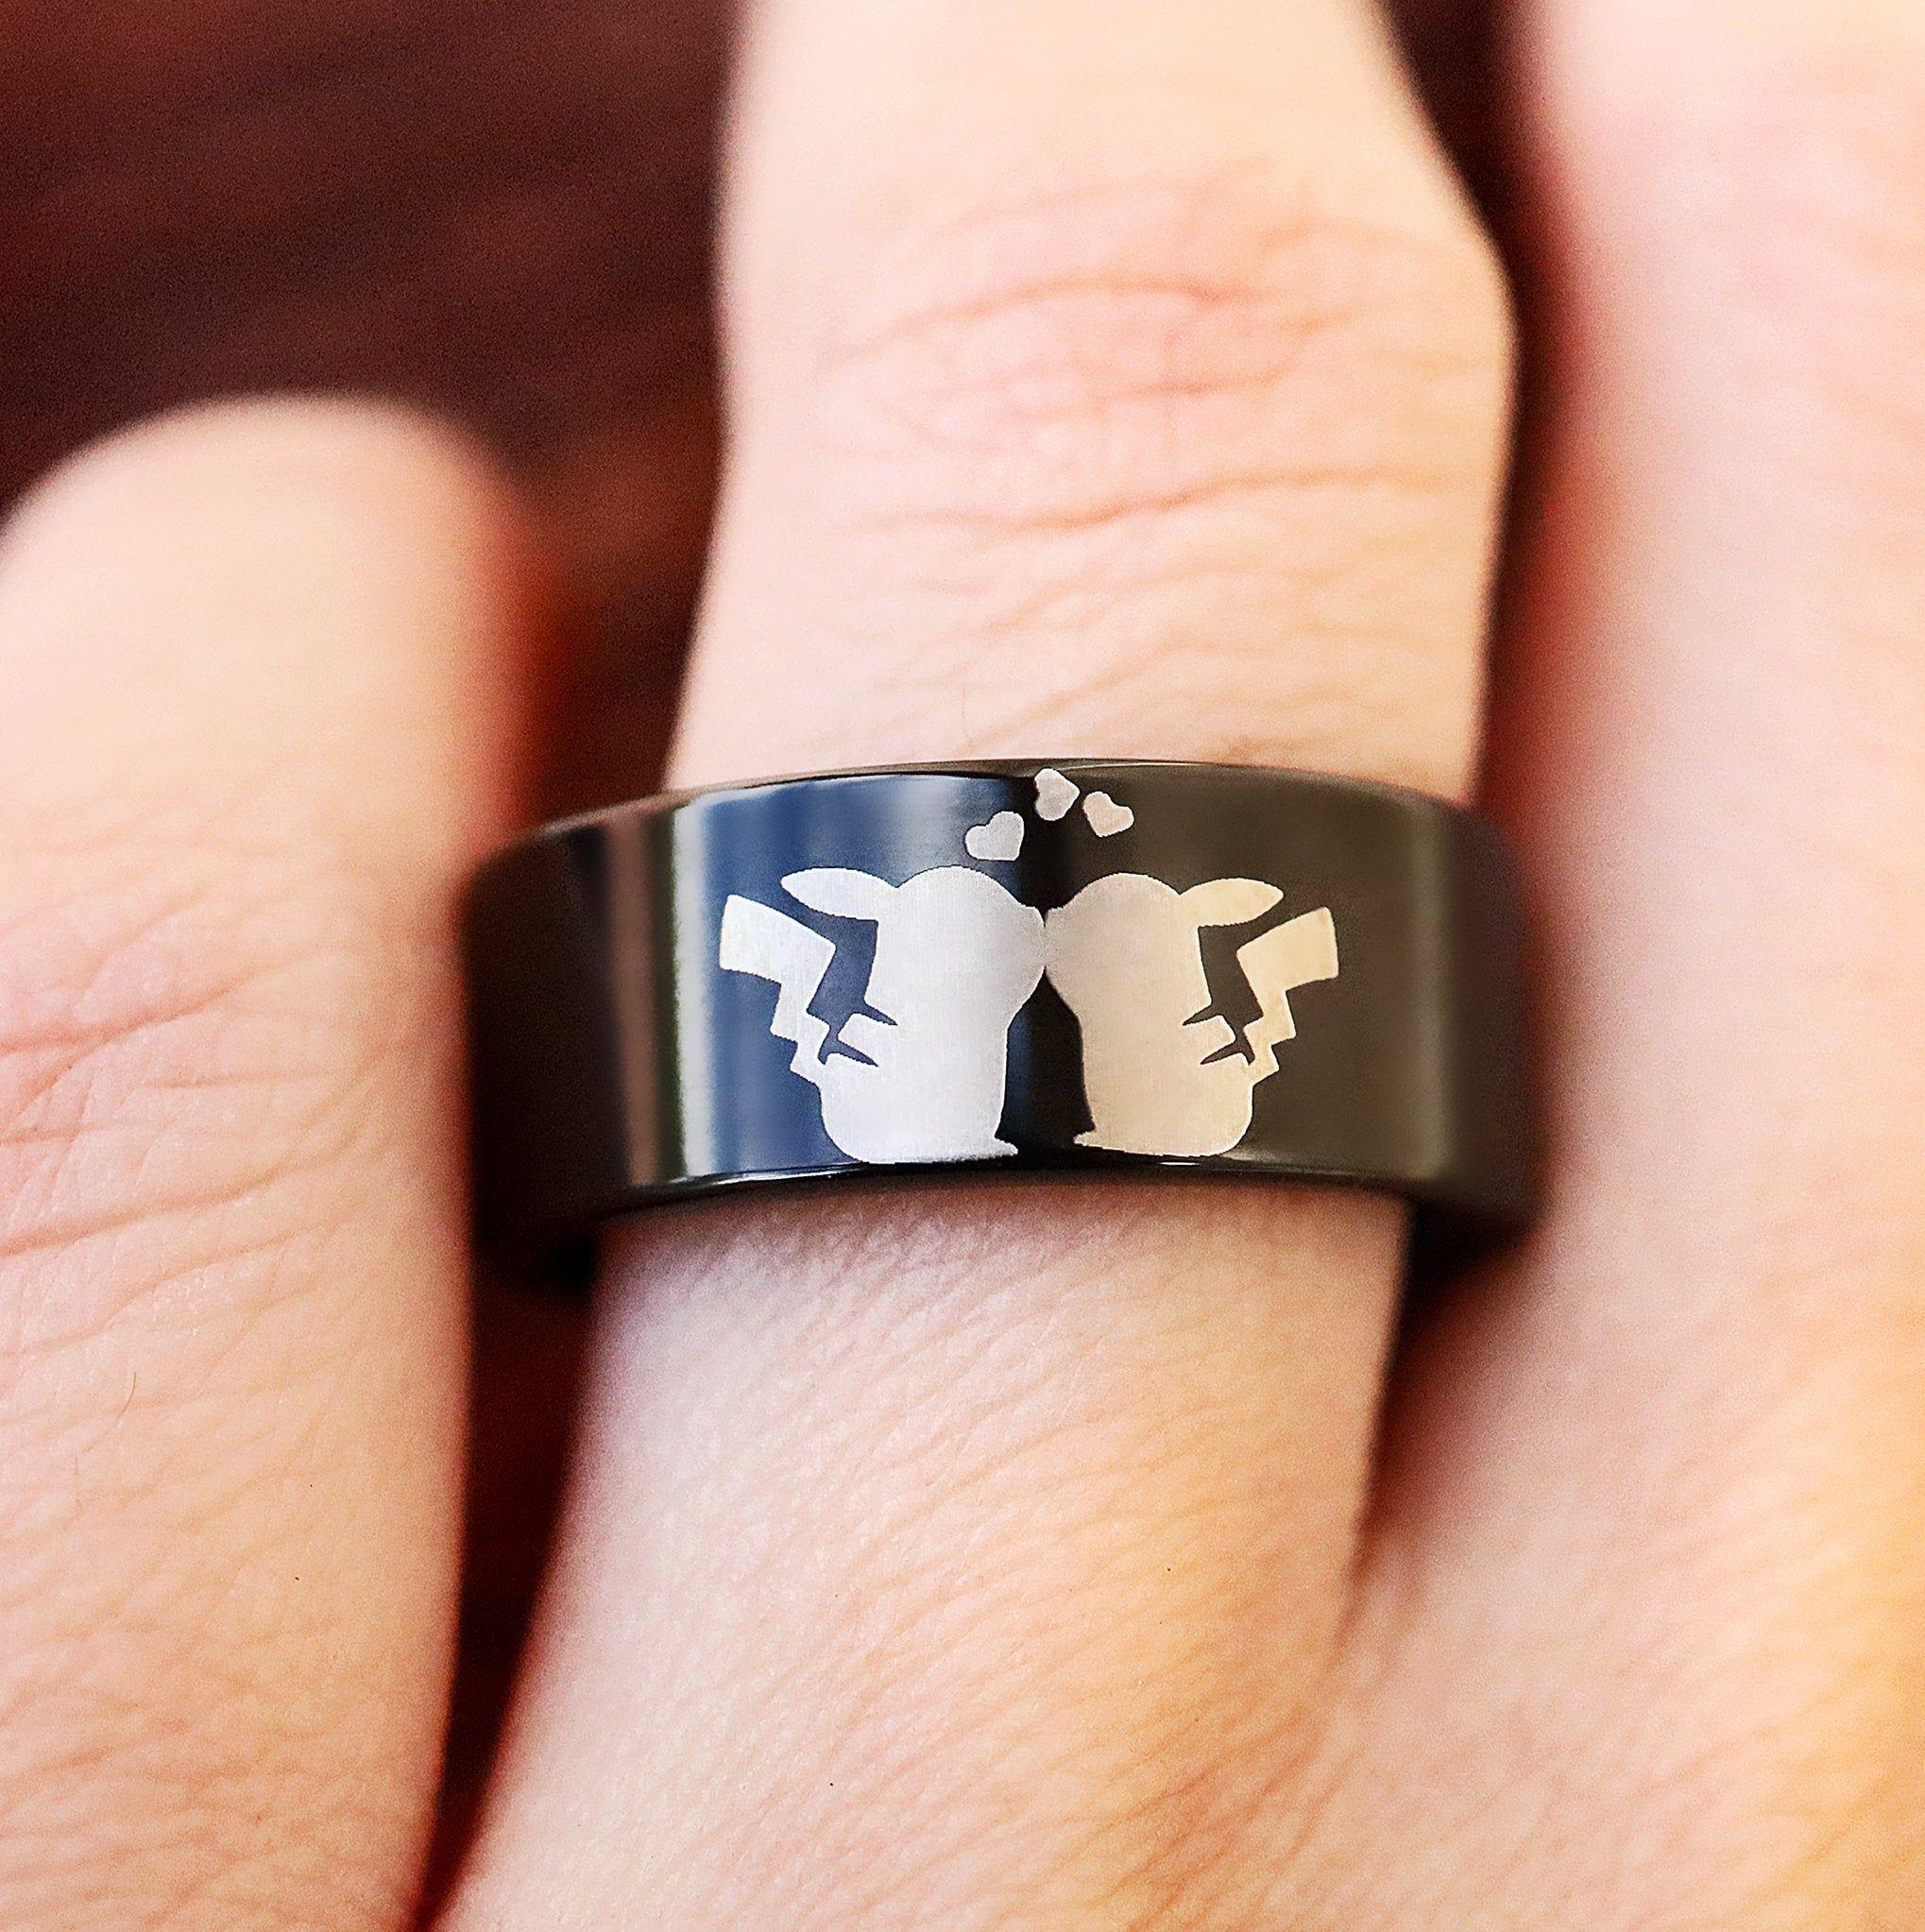 Pikachu Wedding Ring Pikachu Couple Ring Pikachu Engraved Ring Pokemon Man Ring Pokemon Wedding Band Pokeball R In 2020 Rings For Men Engraved Rings Pokeball Ring